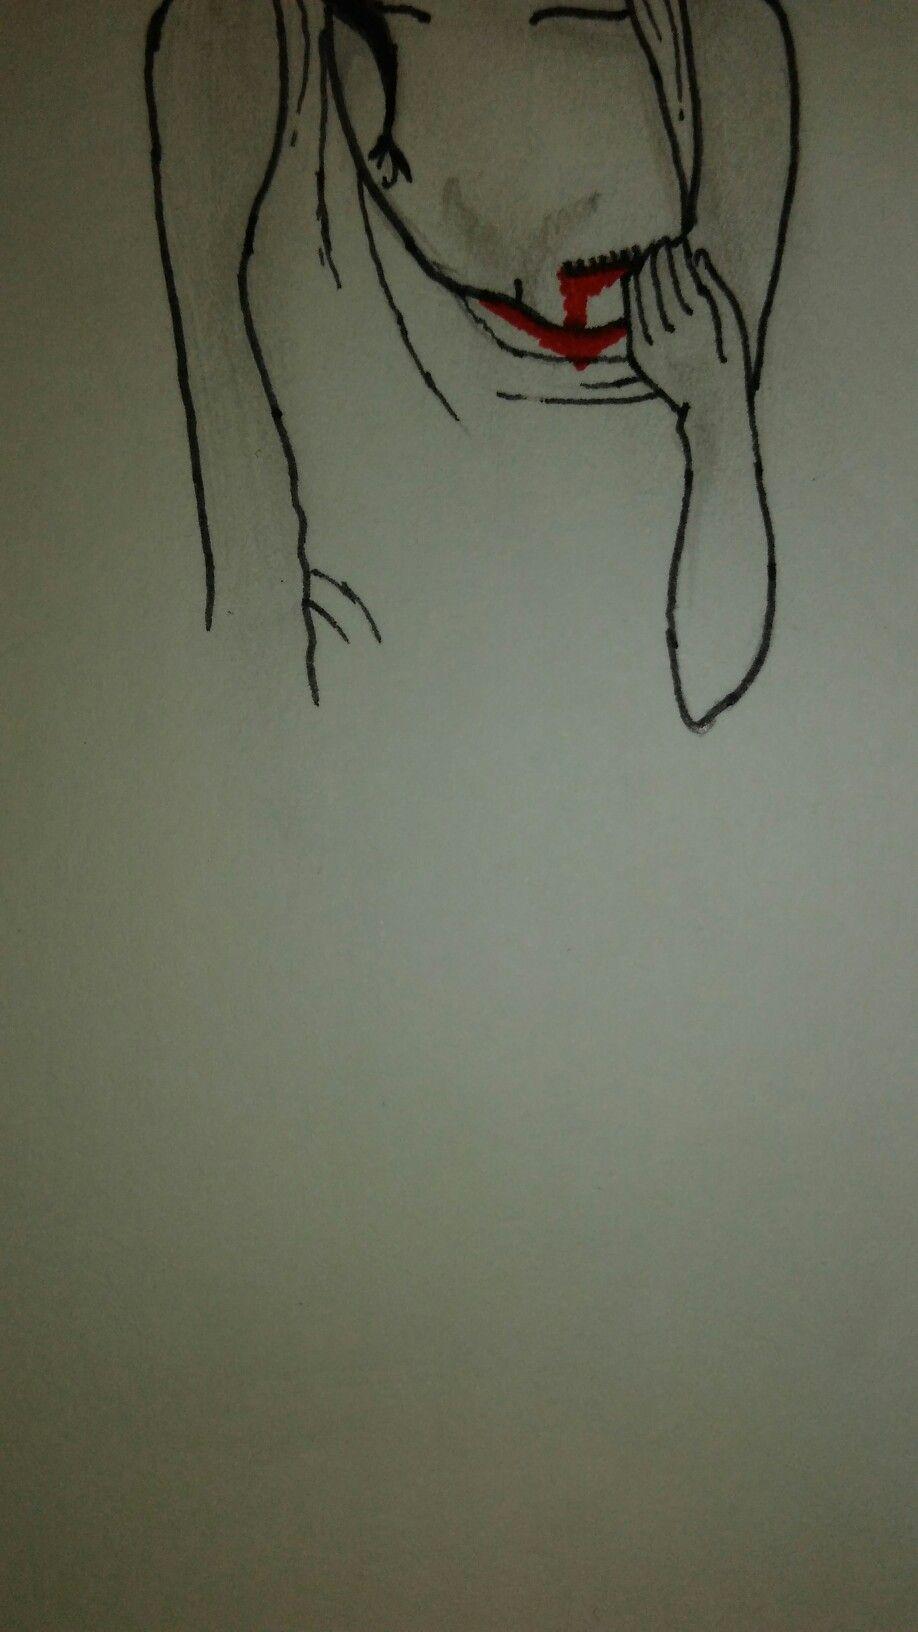 Girl sad sketch